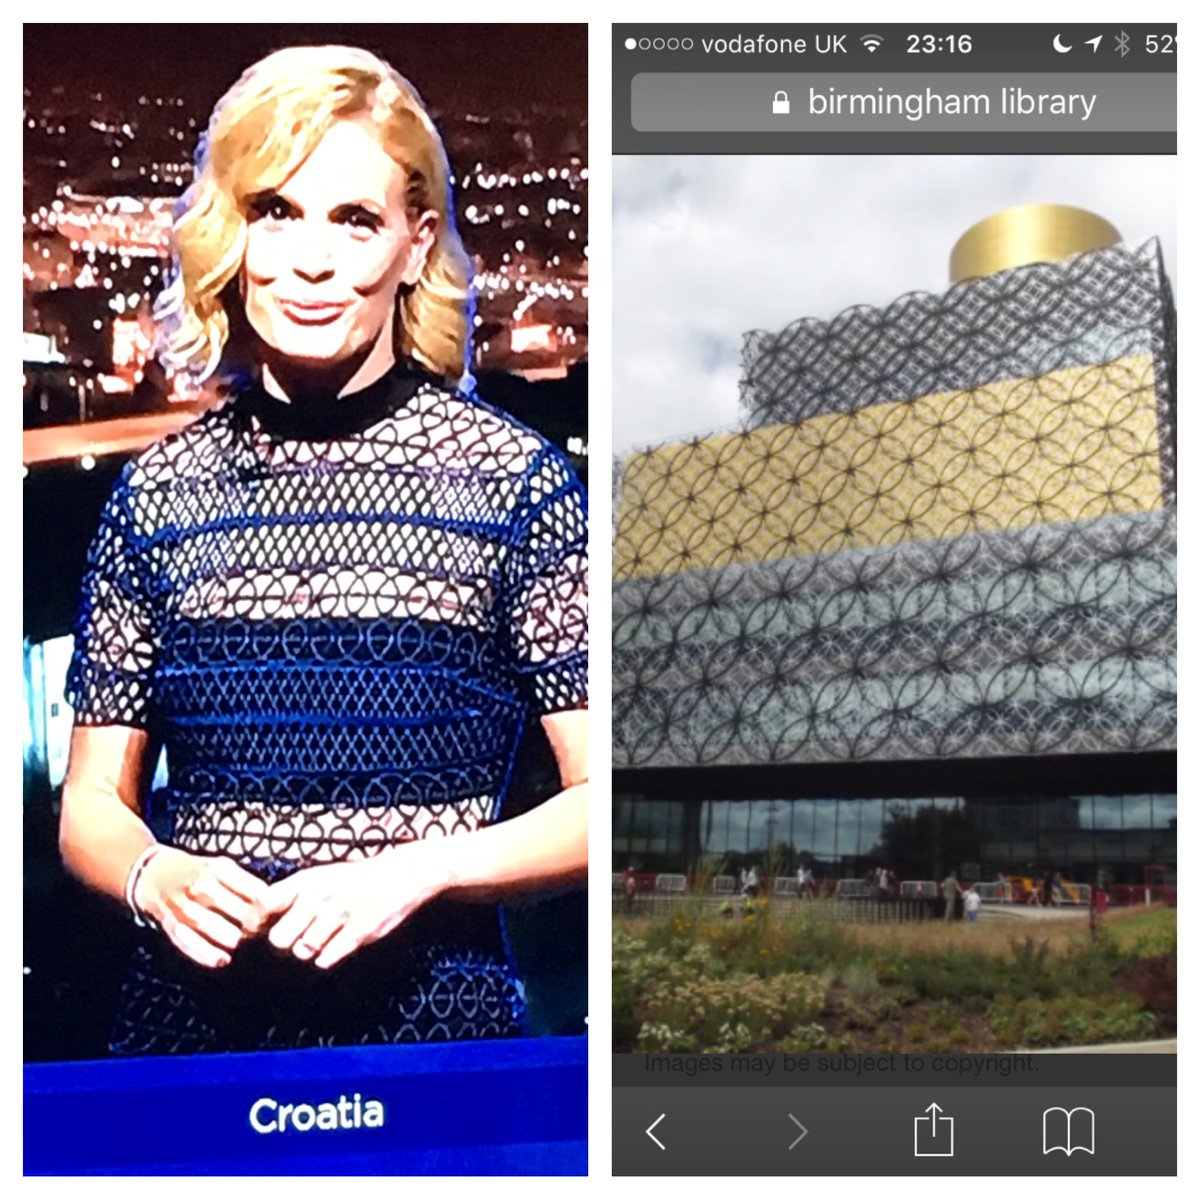 Croatia is wearing the Birmingham Library:   #Eurovision  #Cro https://t.co/RRSOVURZBF